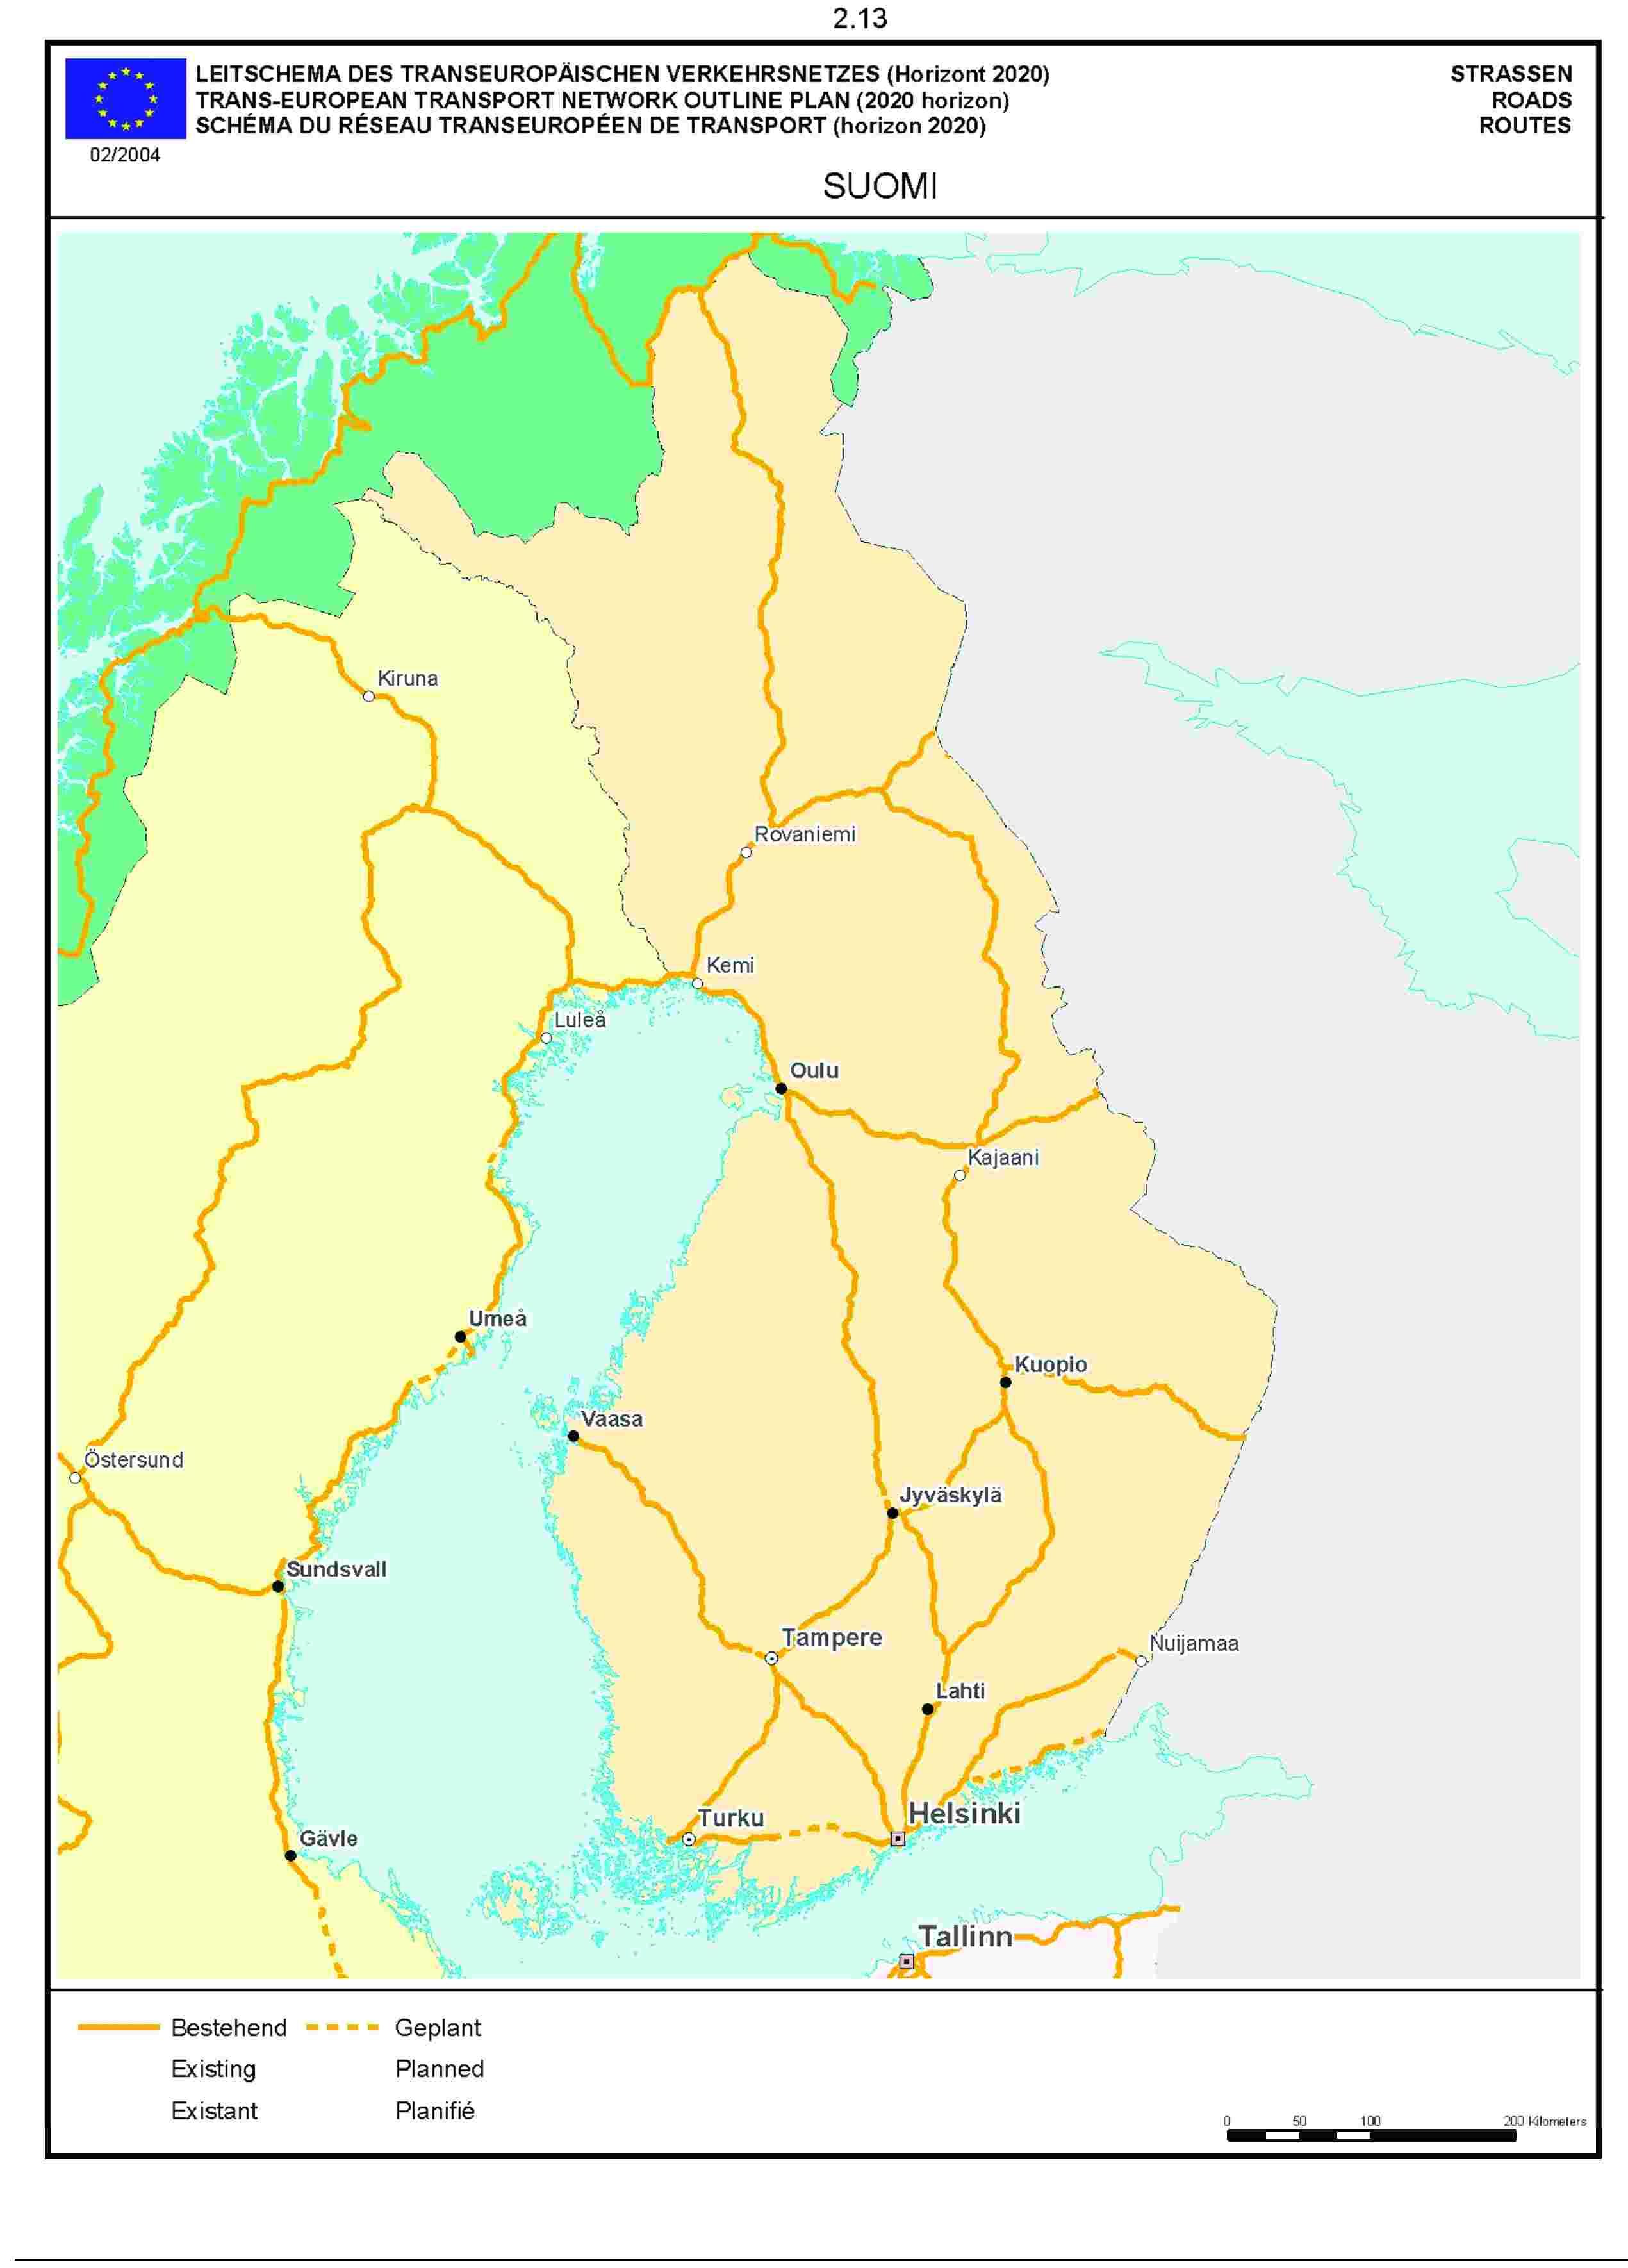 2.13LEITSCHEMA DES TRANSEUROPÄISCHEN VERKEHRSNETZES (Horizont 2020) STRASSENTRANS-EUROPEAN TRANSPORT NETWORK OUTLINE PLAN (2020 horizon) ROADSSCHÉMA DU RÉSEAU TRANSEUROPÉEN DE TRANSPORT (horizon 2020) ROUTE02/2004SUOMI